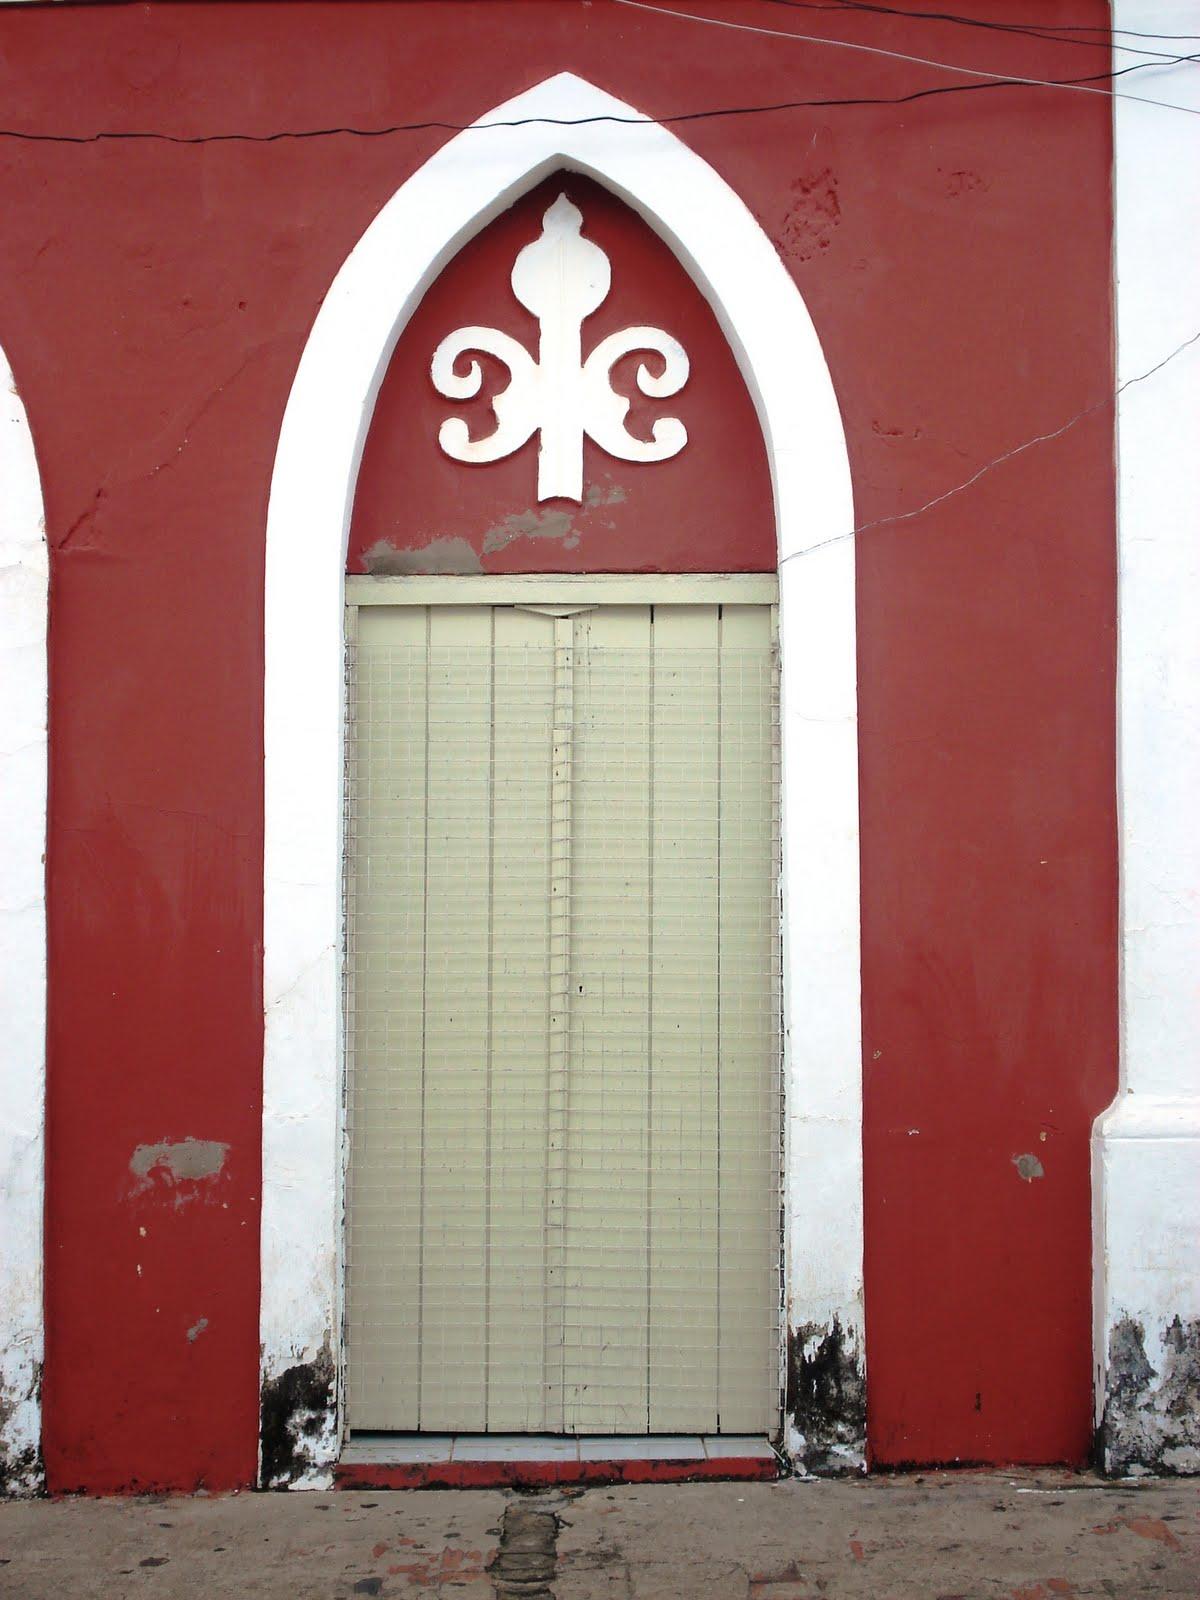 #893735 KAKI AFONSO Arquitetura: Janelas da arquitetura piauiense: Amarante. 570 Janelas Em Arco Pleno